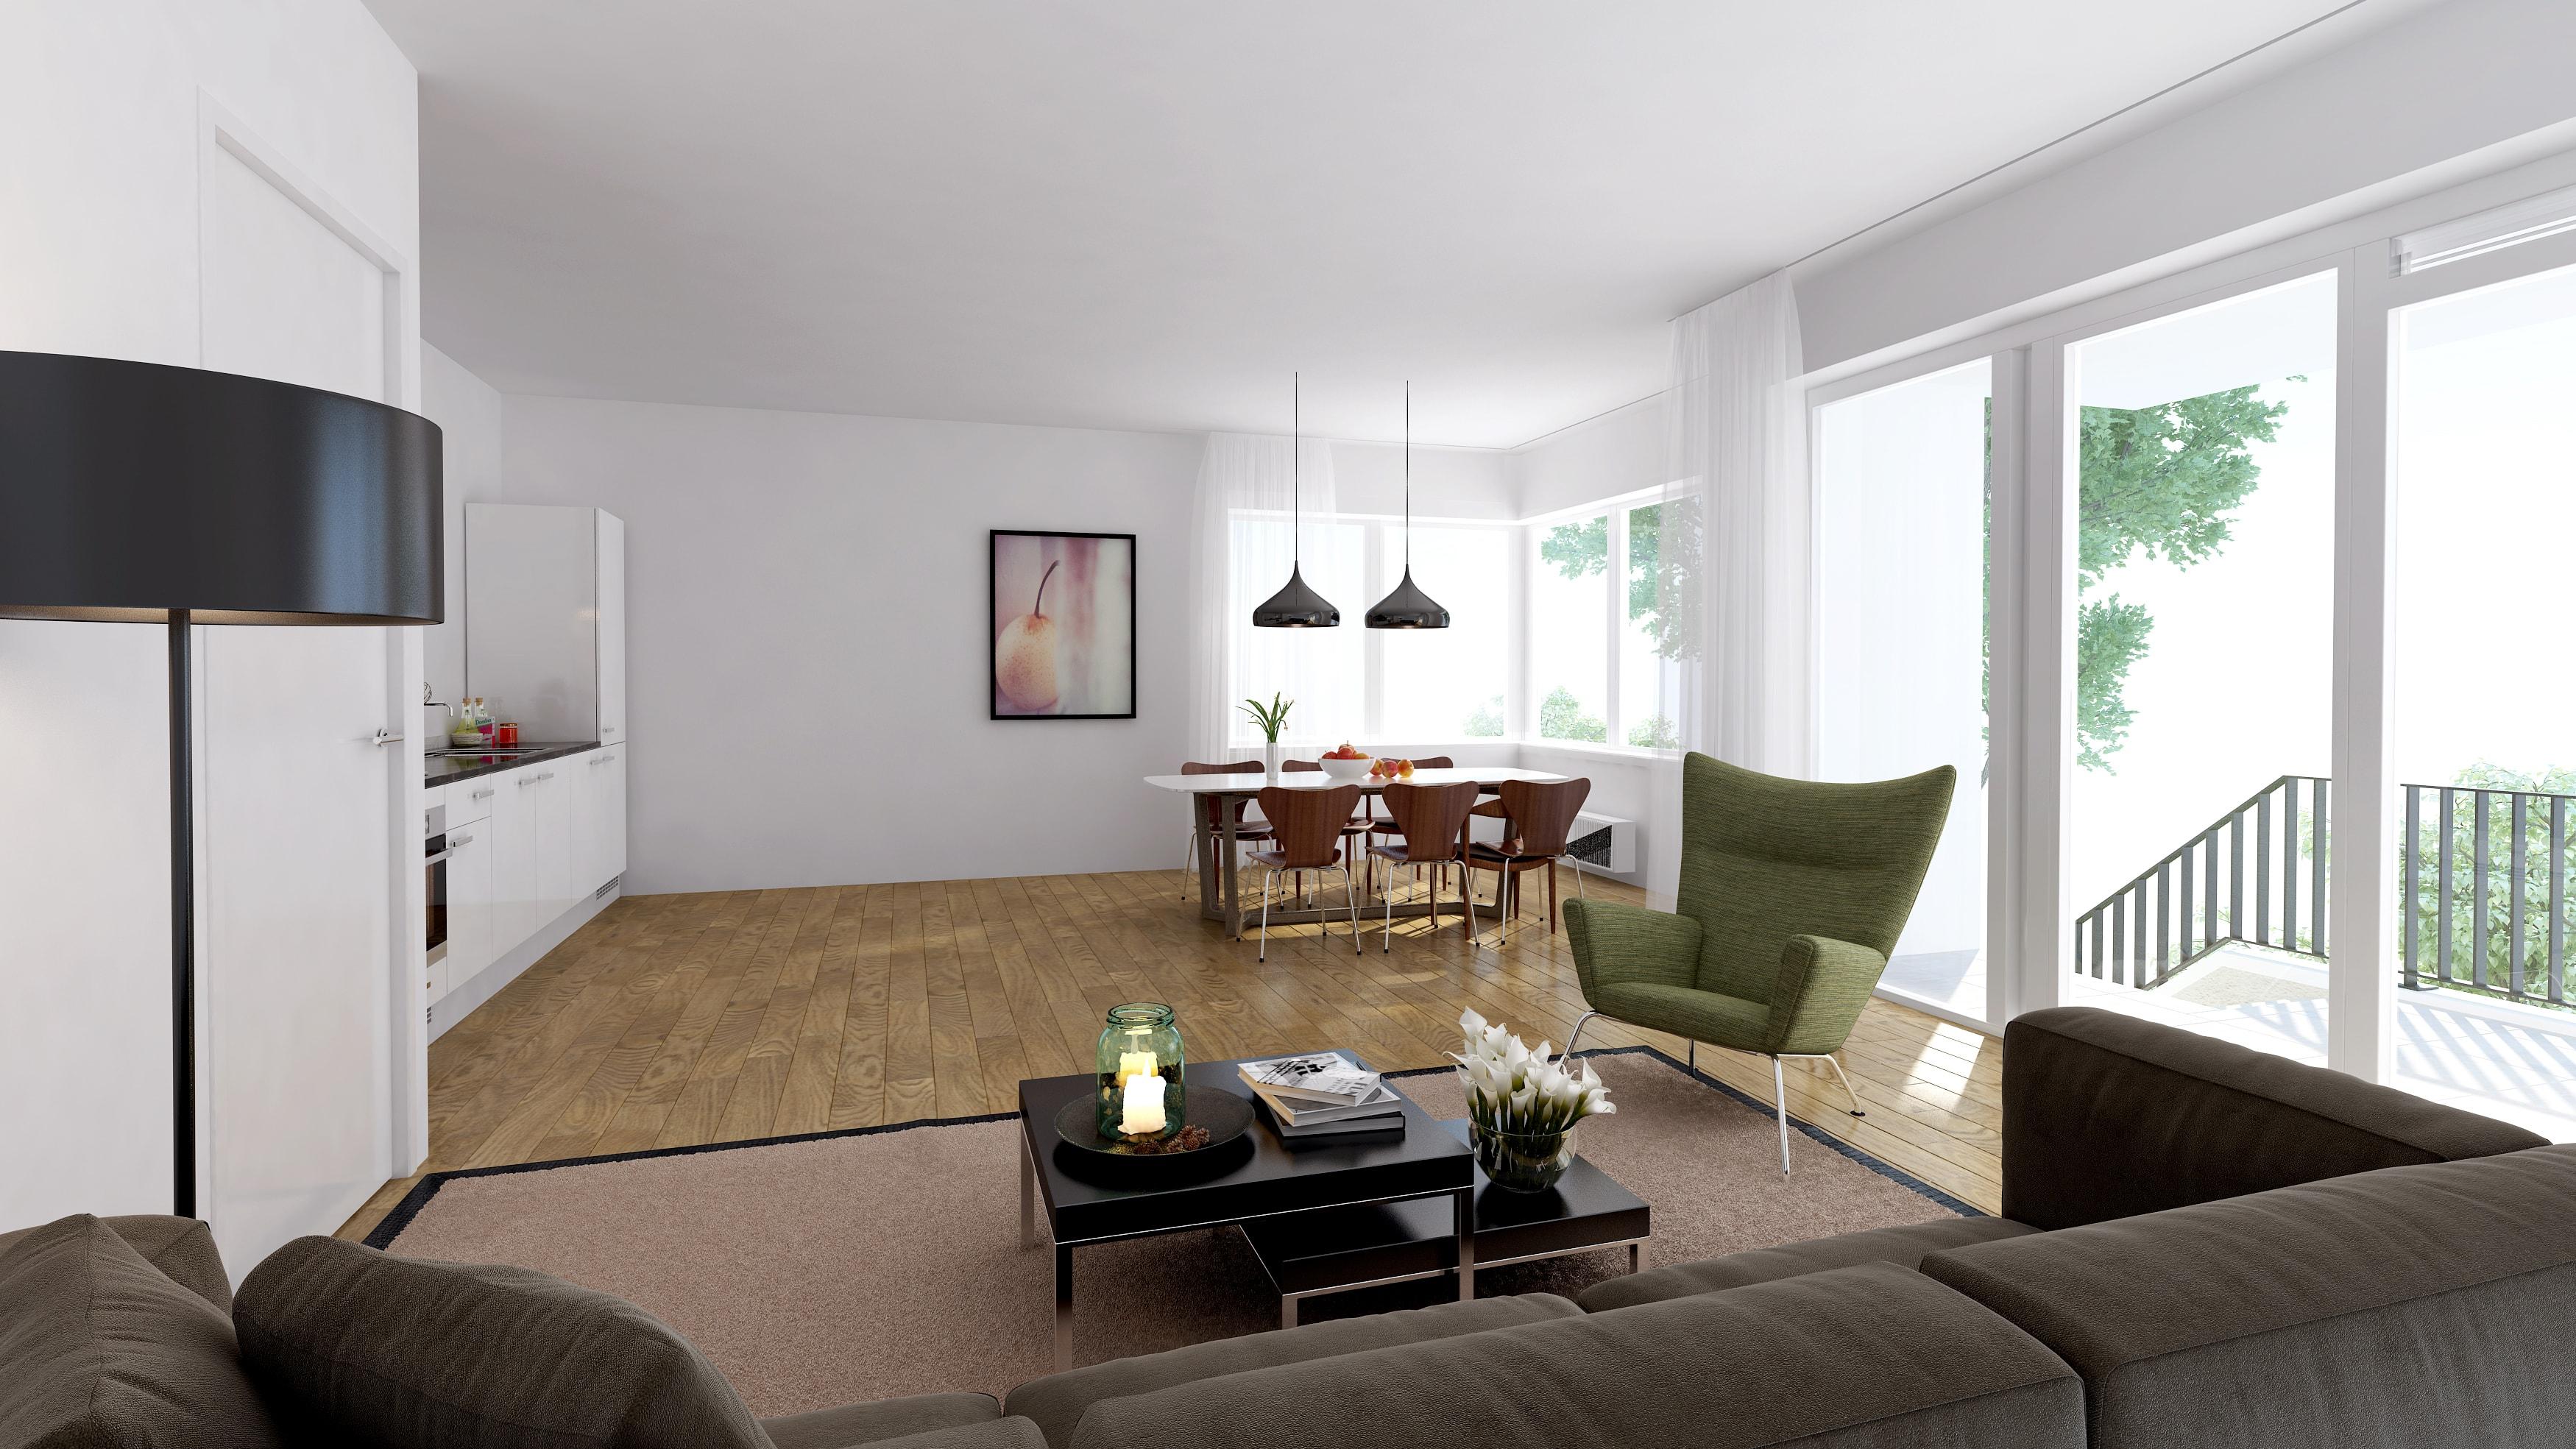 Property Development Header : Nieuwbouwcomplex de hagen amsterdam